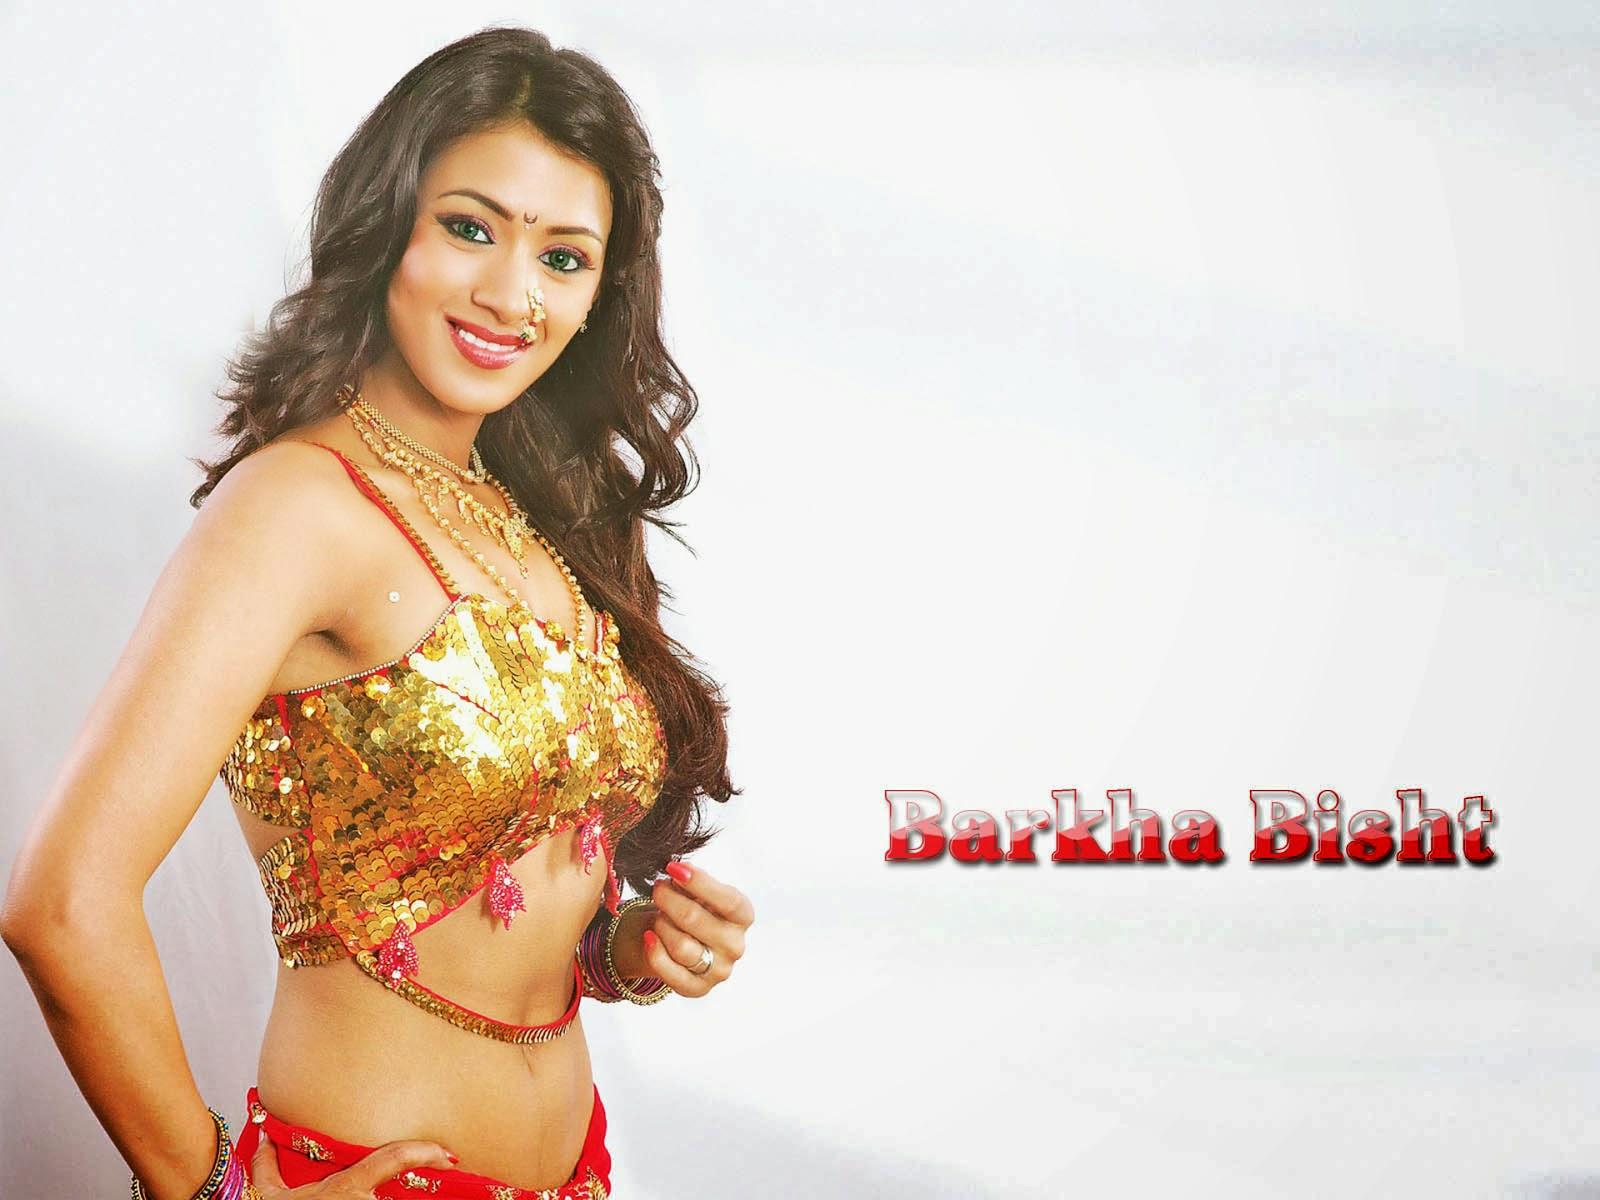 Barkha Bisht HD Pics